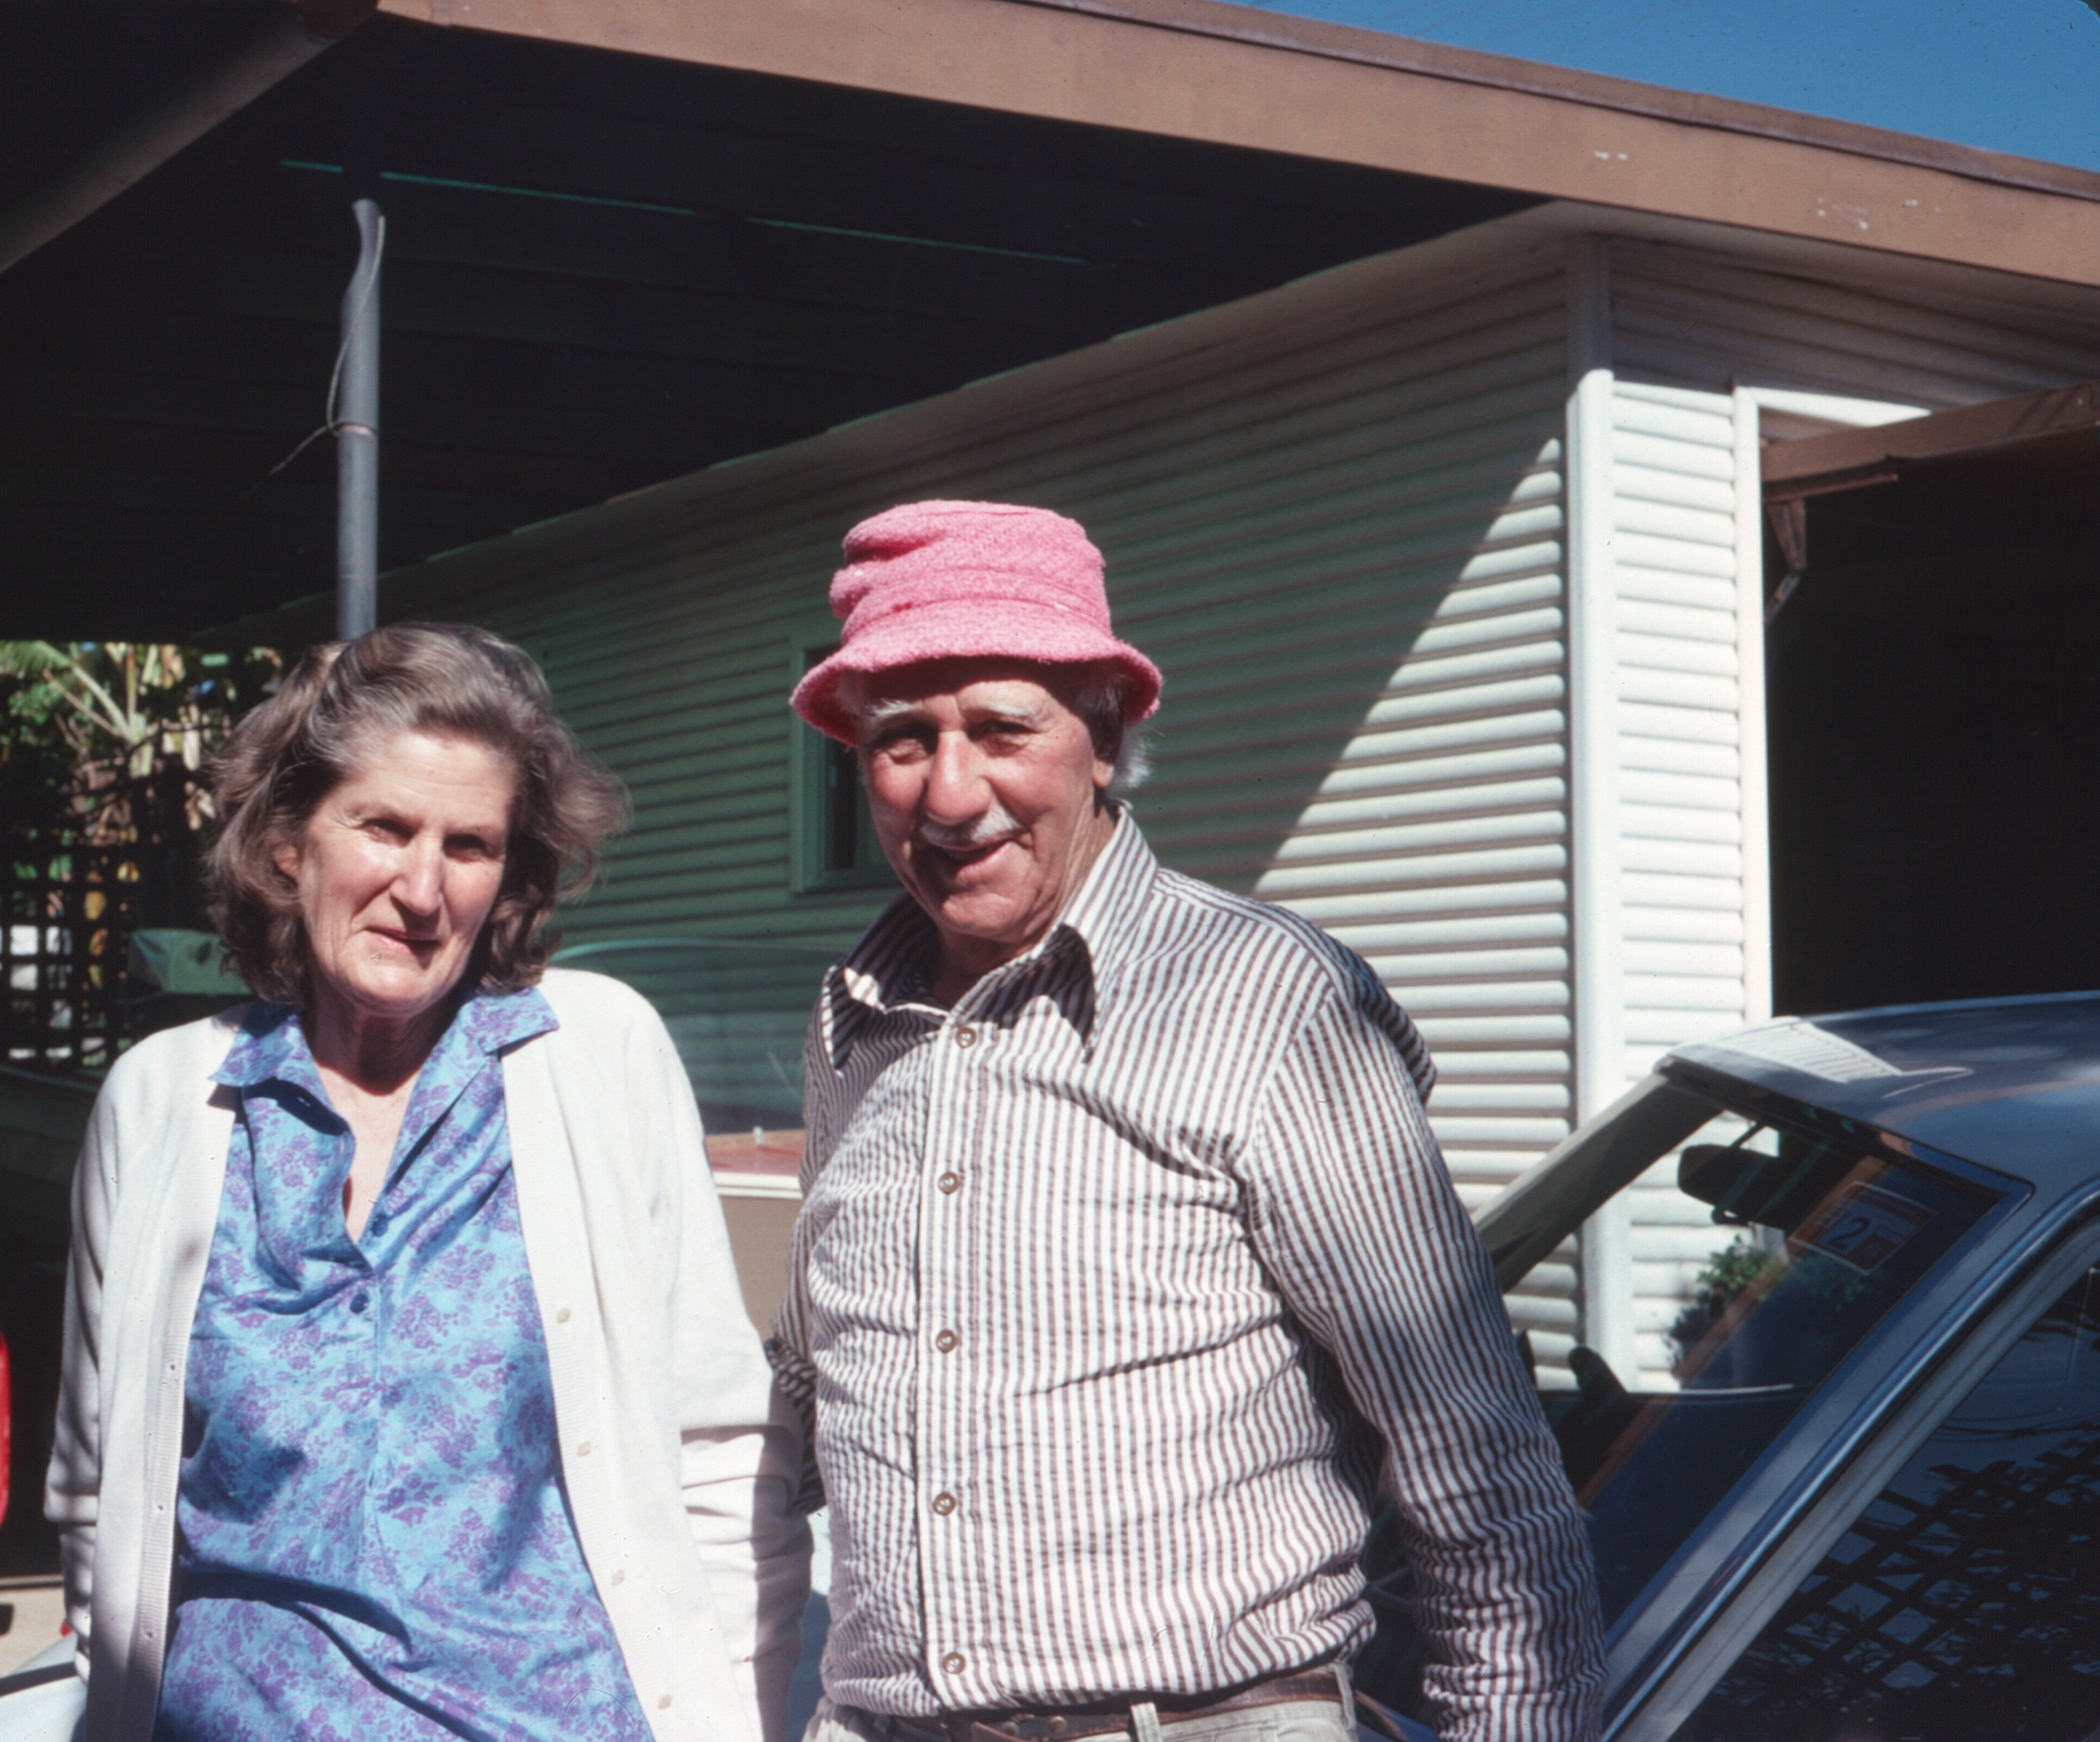 Phil and Jane de Crespigny